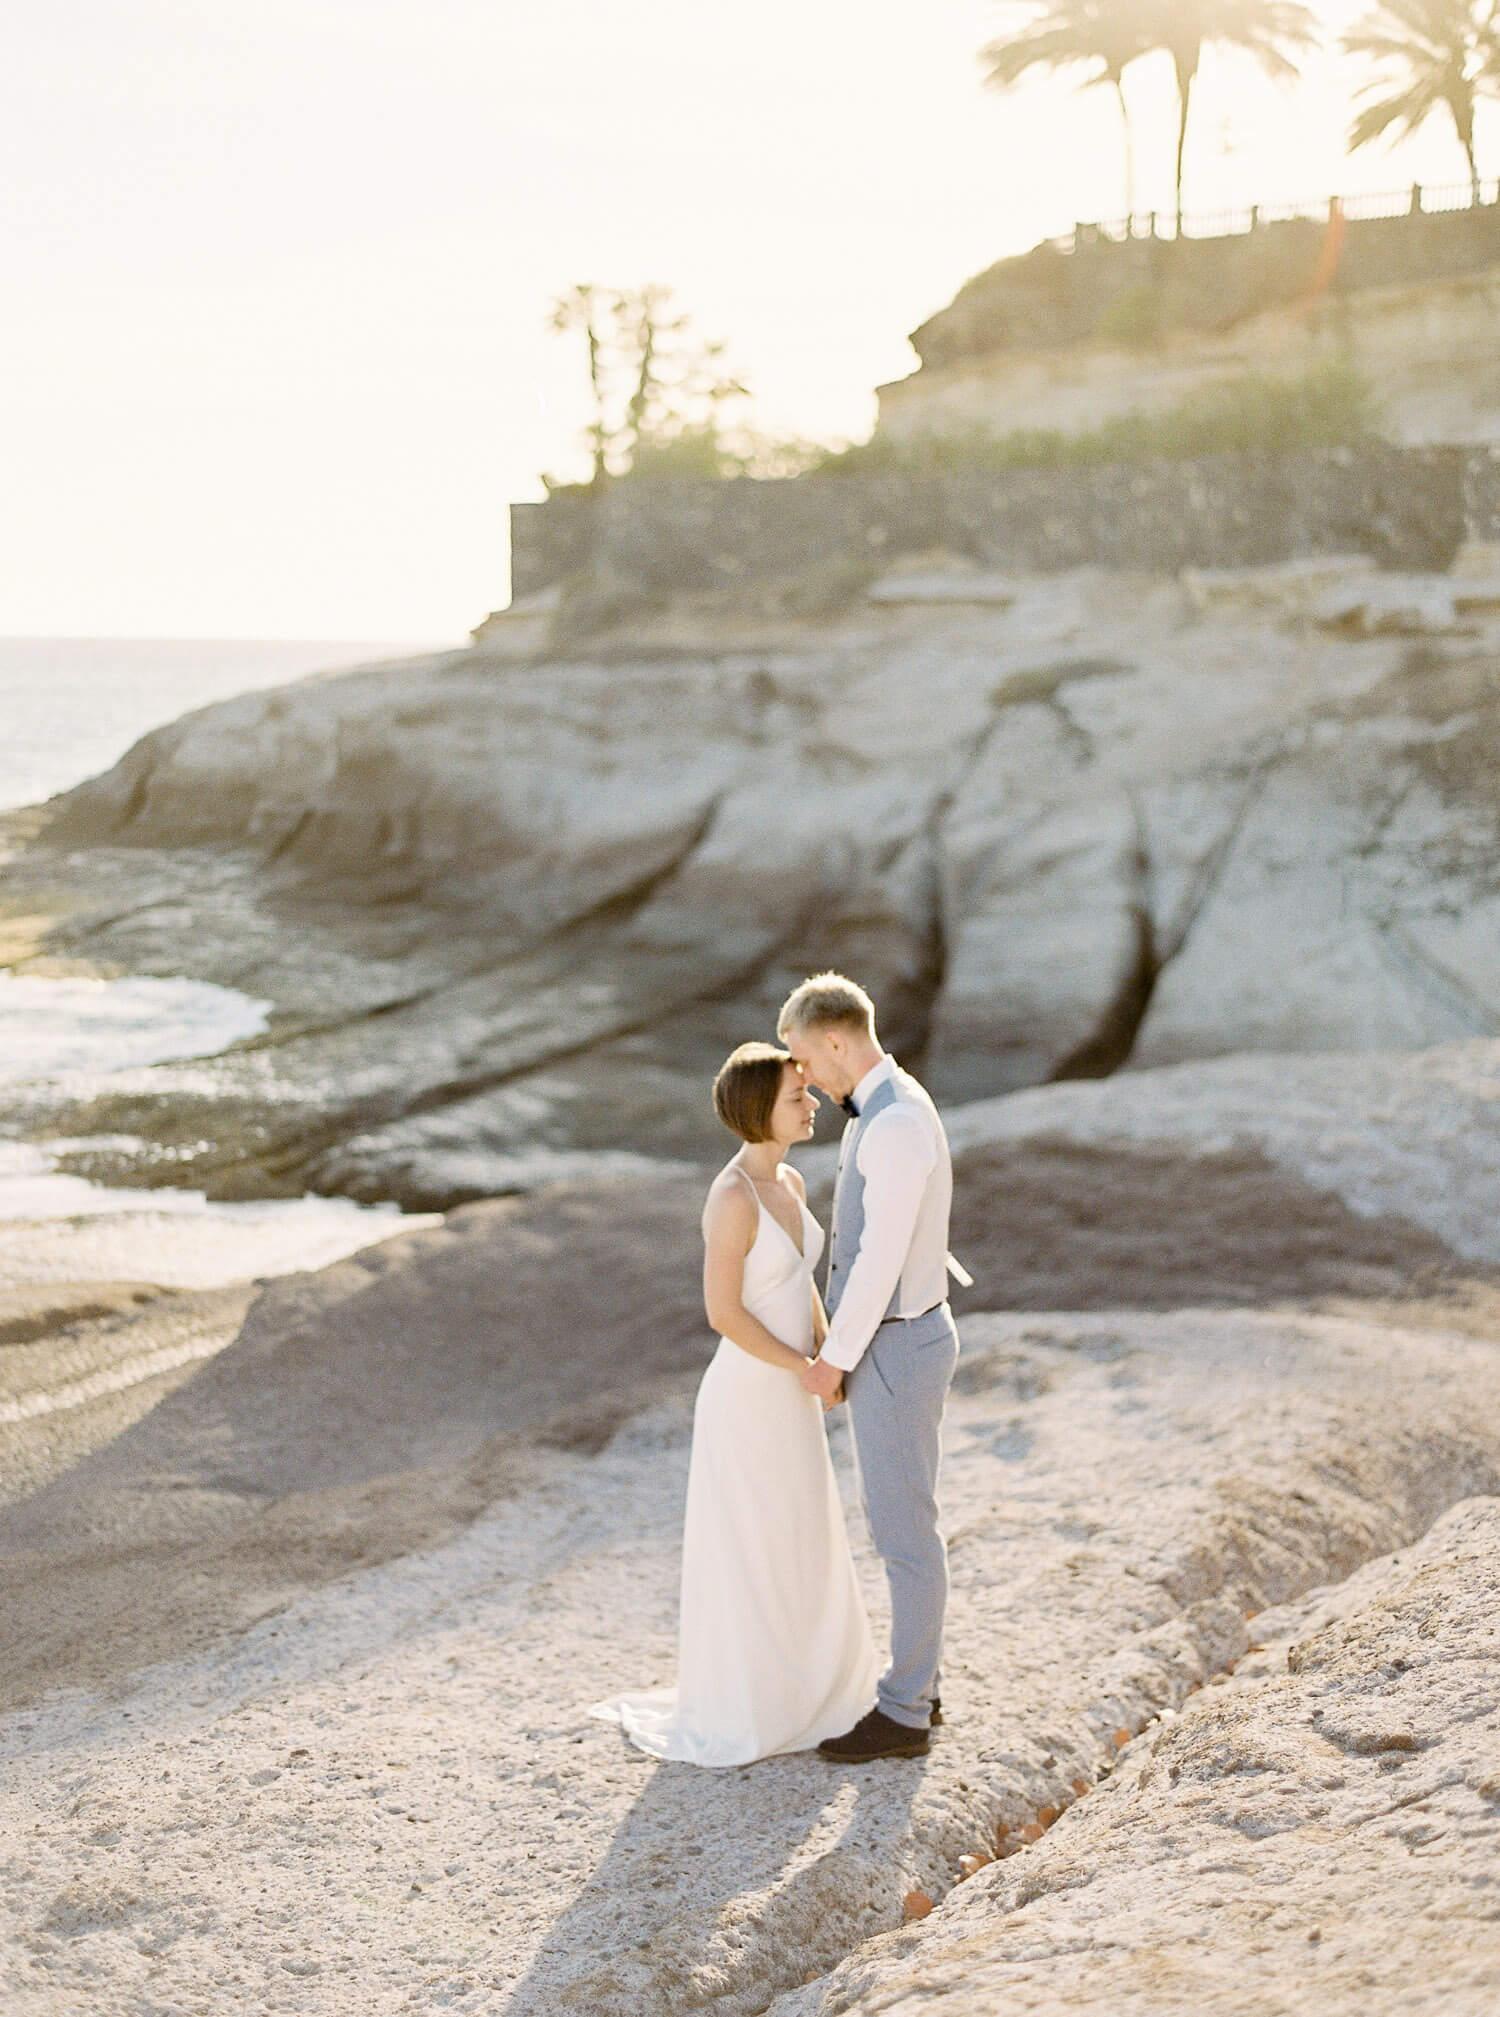 film wedding photographer in Spain